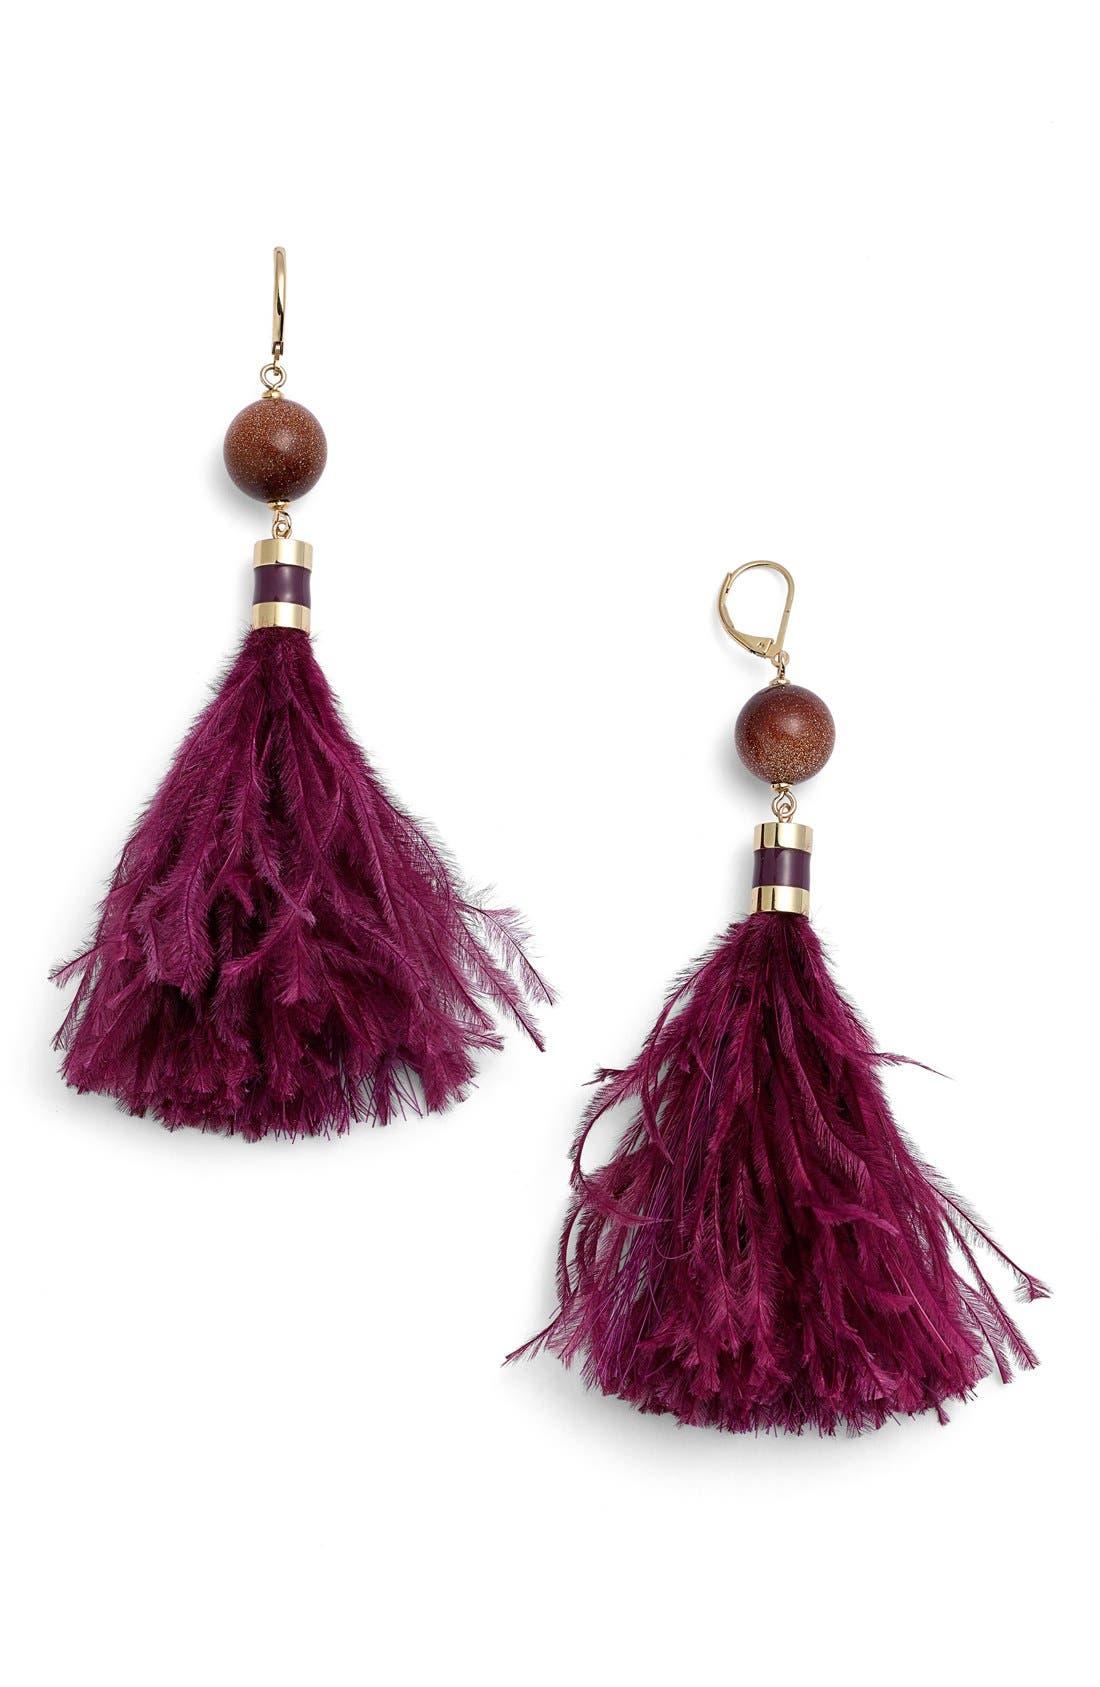 Alternate Image 1 Selected - kate spade new york 'swing time' tassel earrings